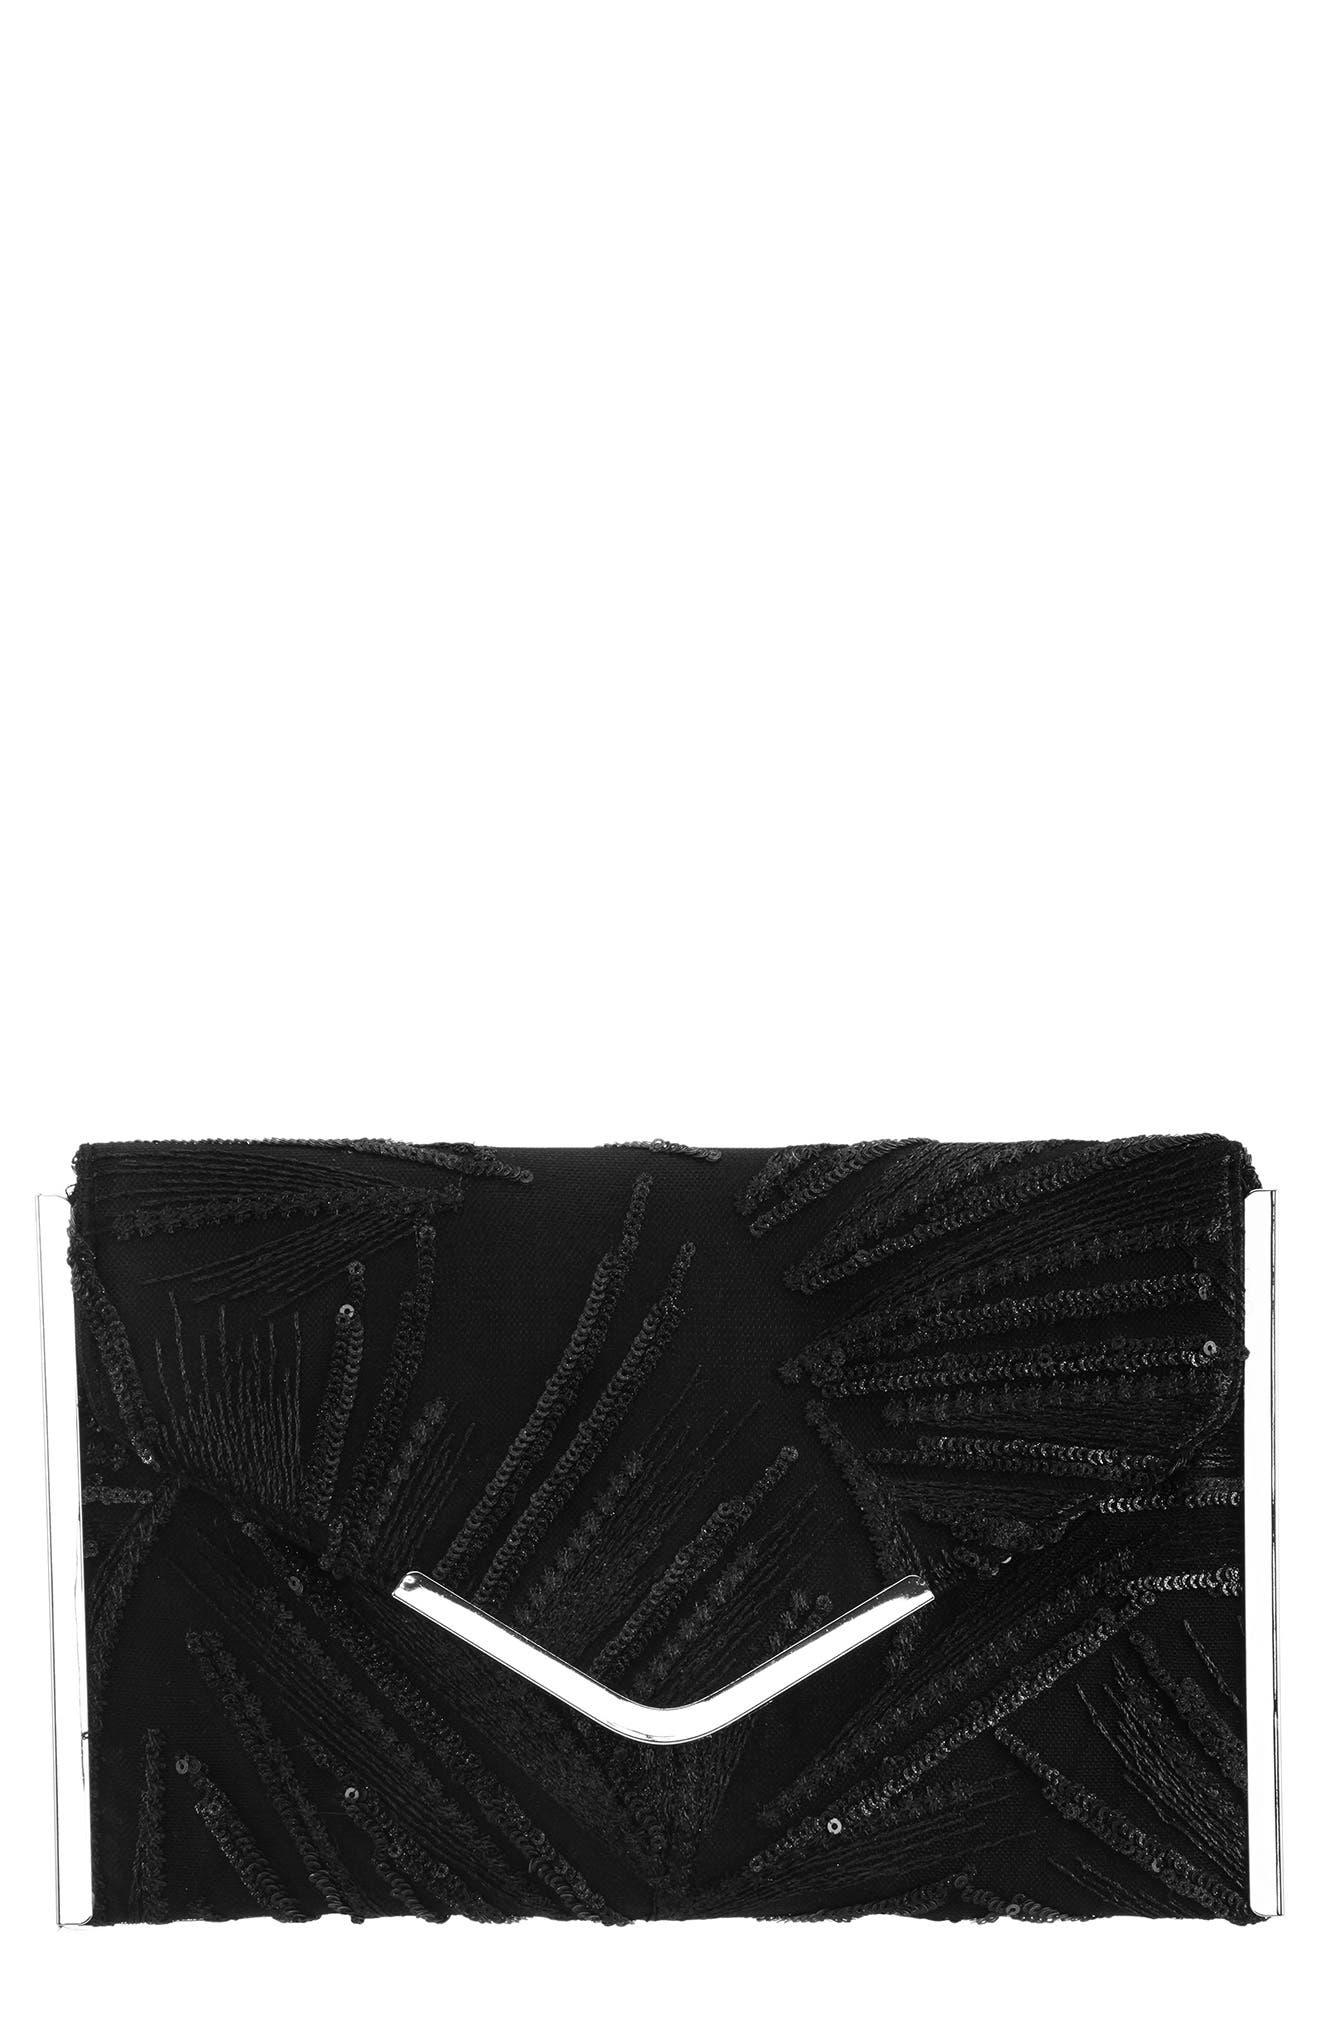 Embroidery Envelope Clutch Bag,                         Main,                         color, BLACK